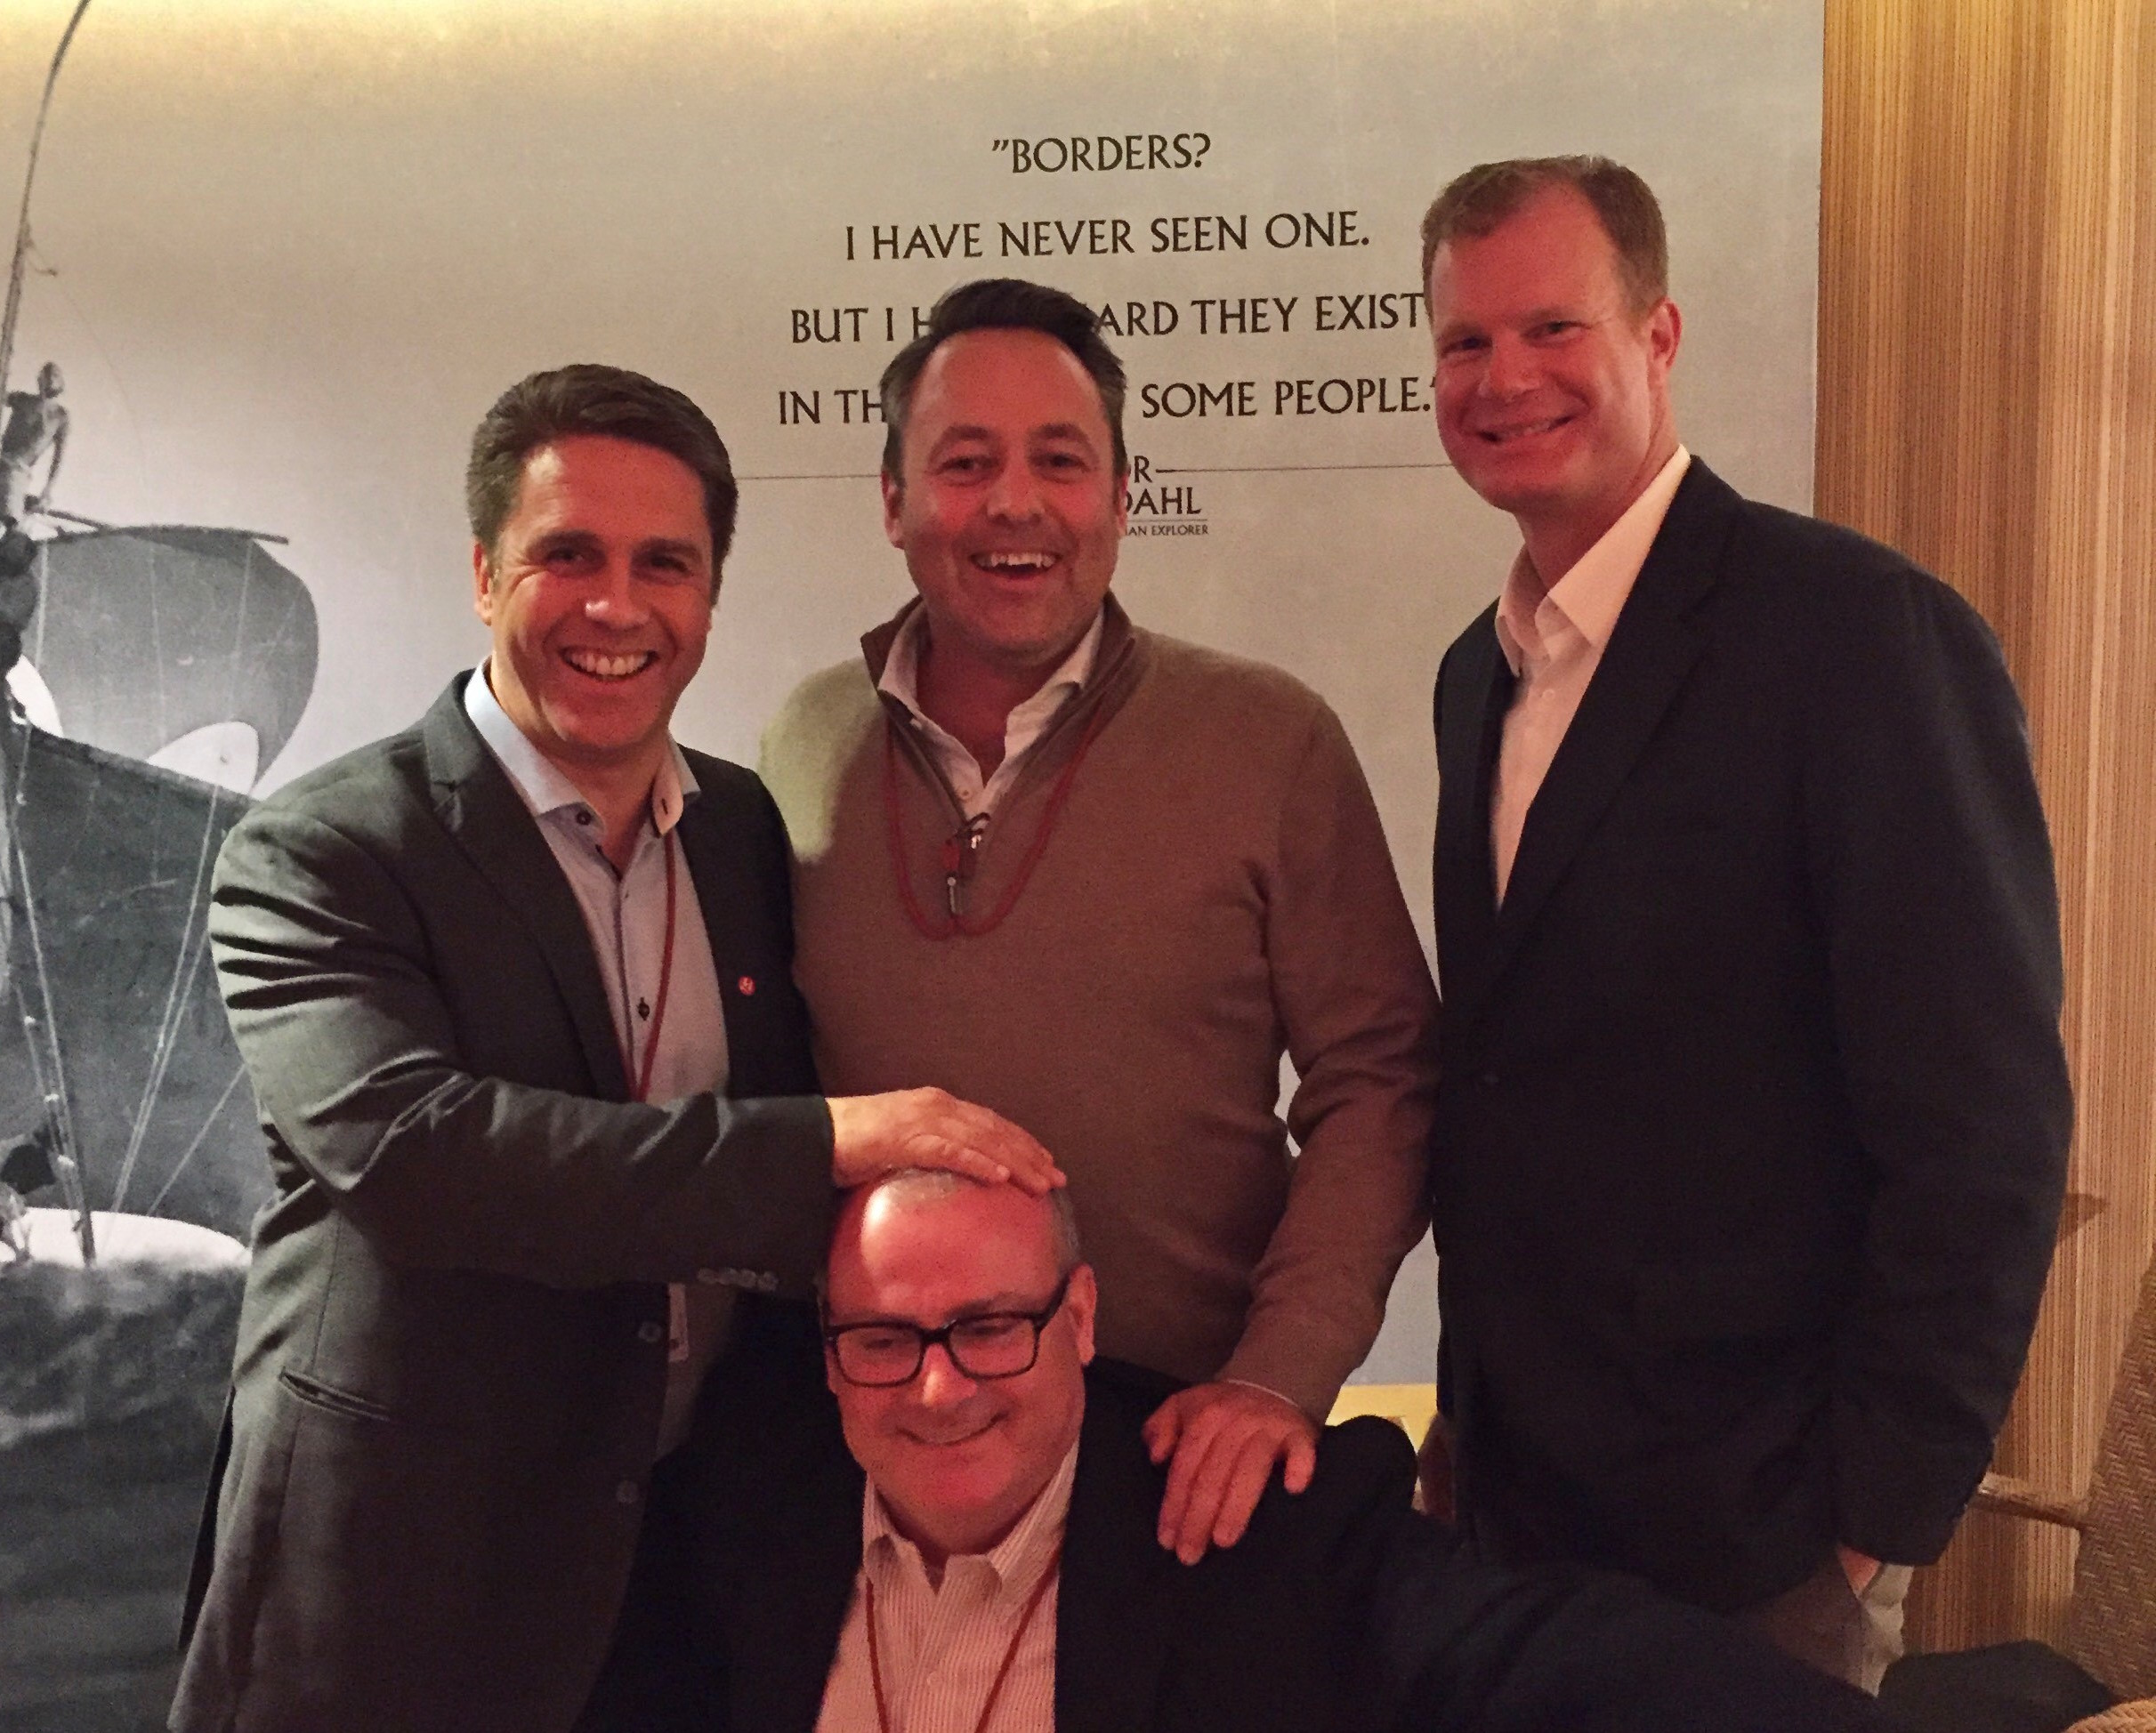 Damian Perry with (L.R) Geir Kronbaeck, VP Global Sales, Gordon Dirker VP USA, and Bill Harber VP APAC for Hurtigruten.